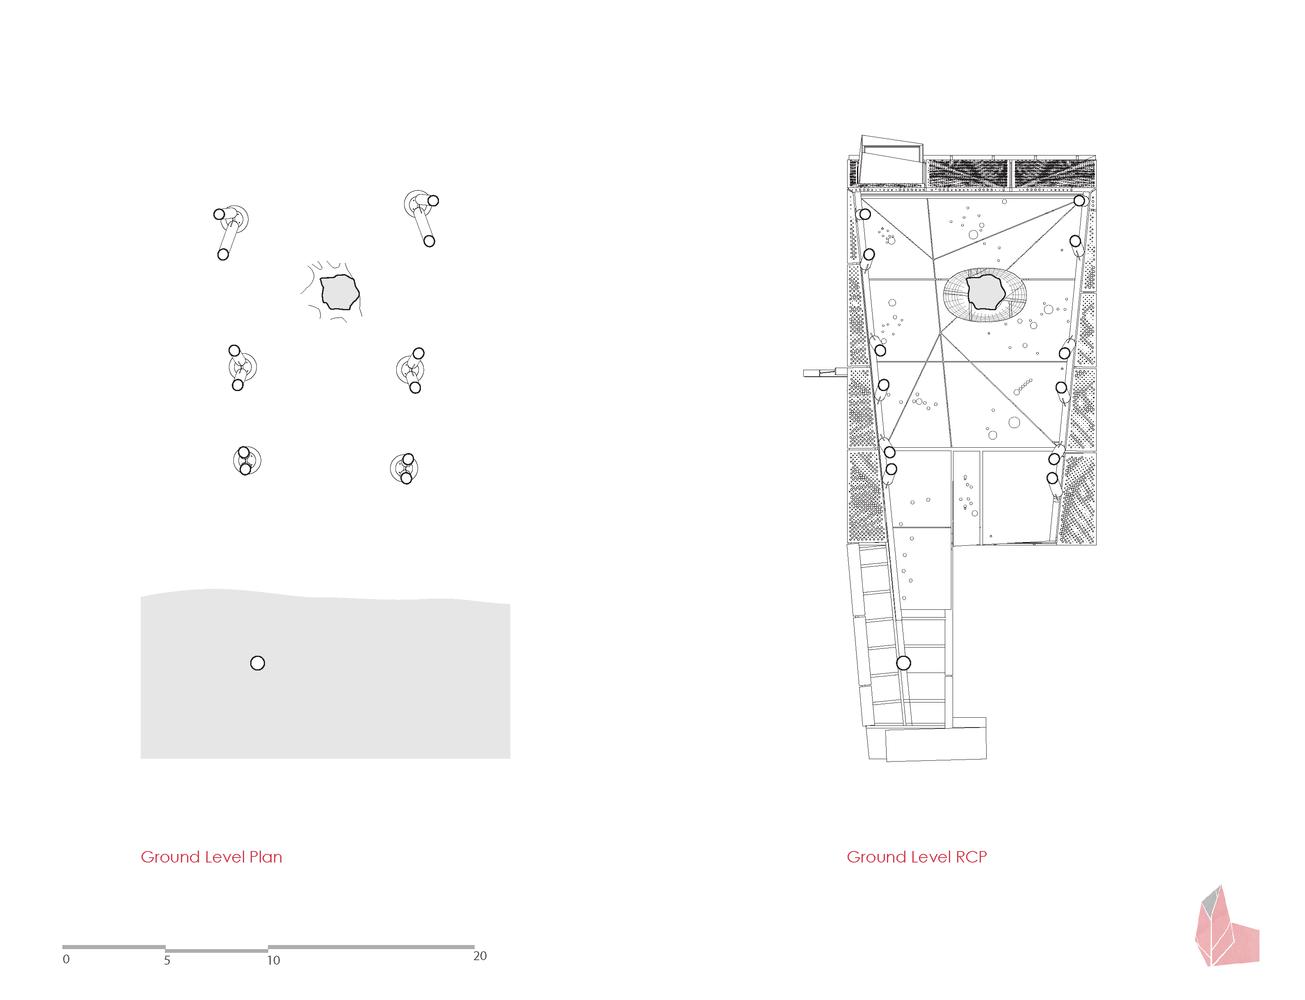 play perch syracuse university [ 1305 x 1000 Pixel ]